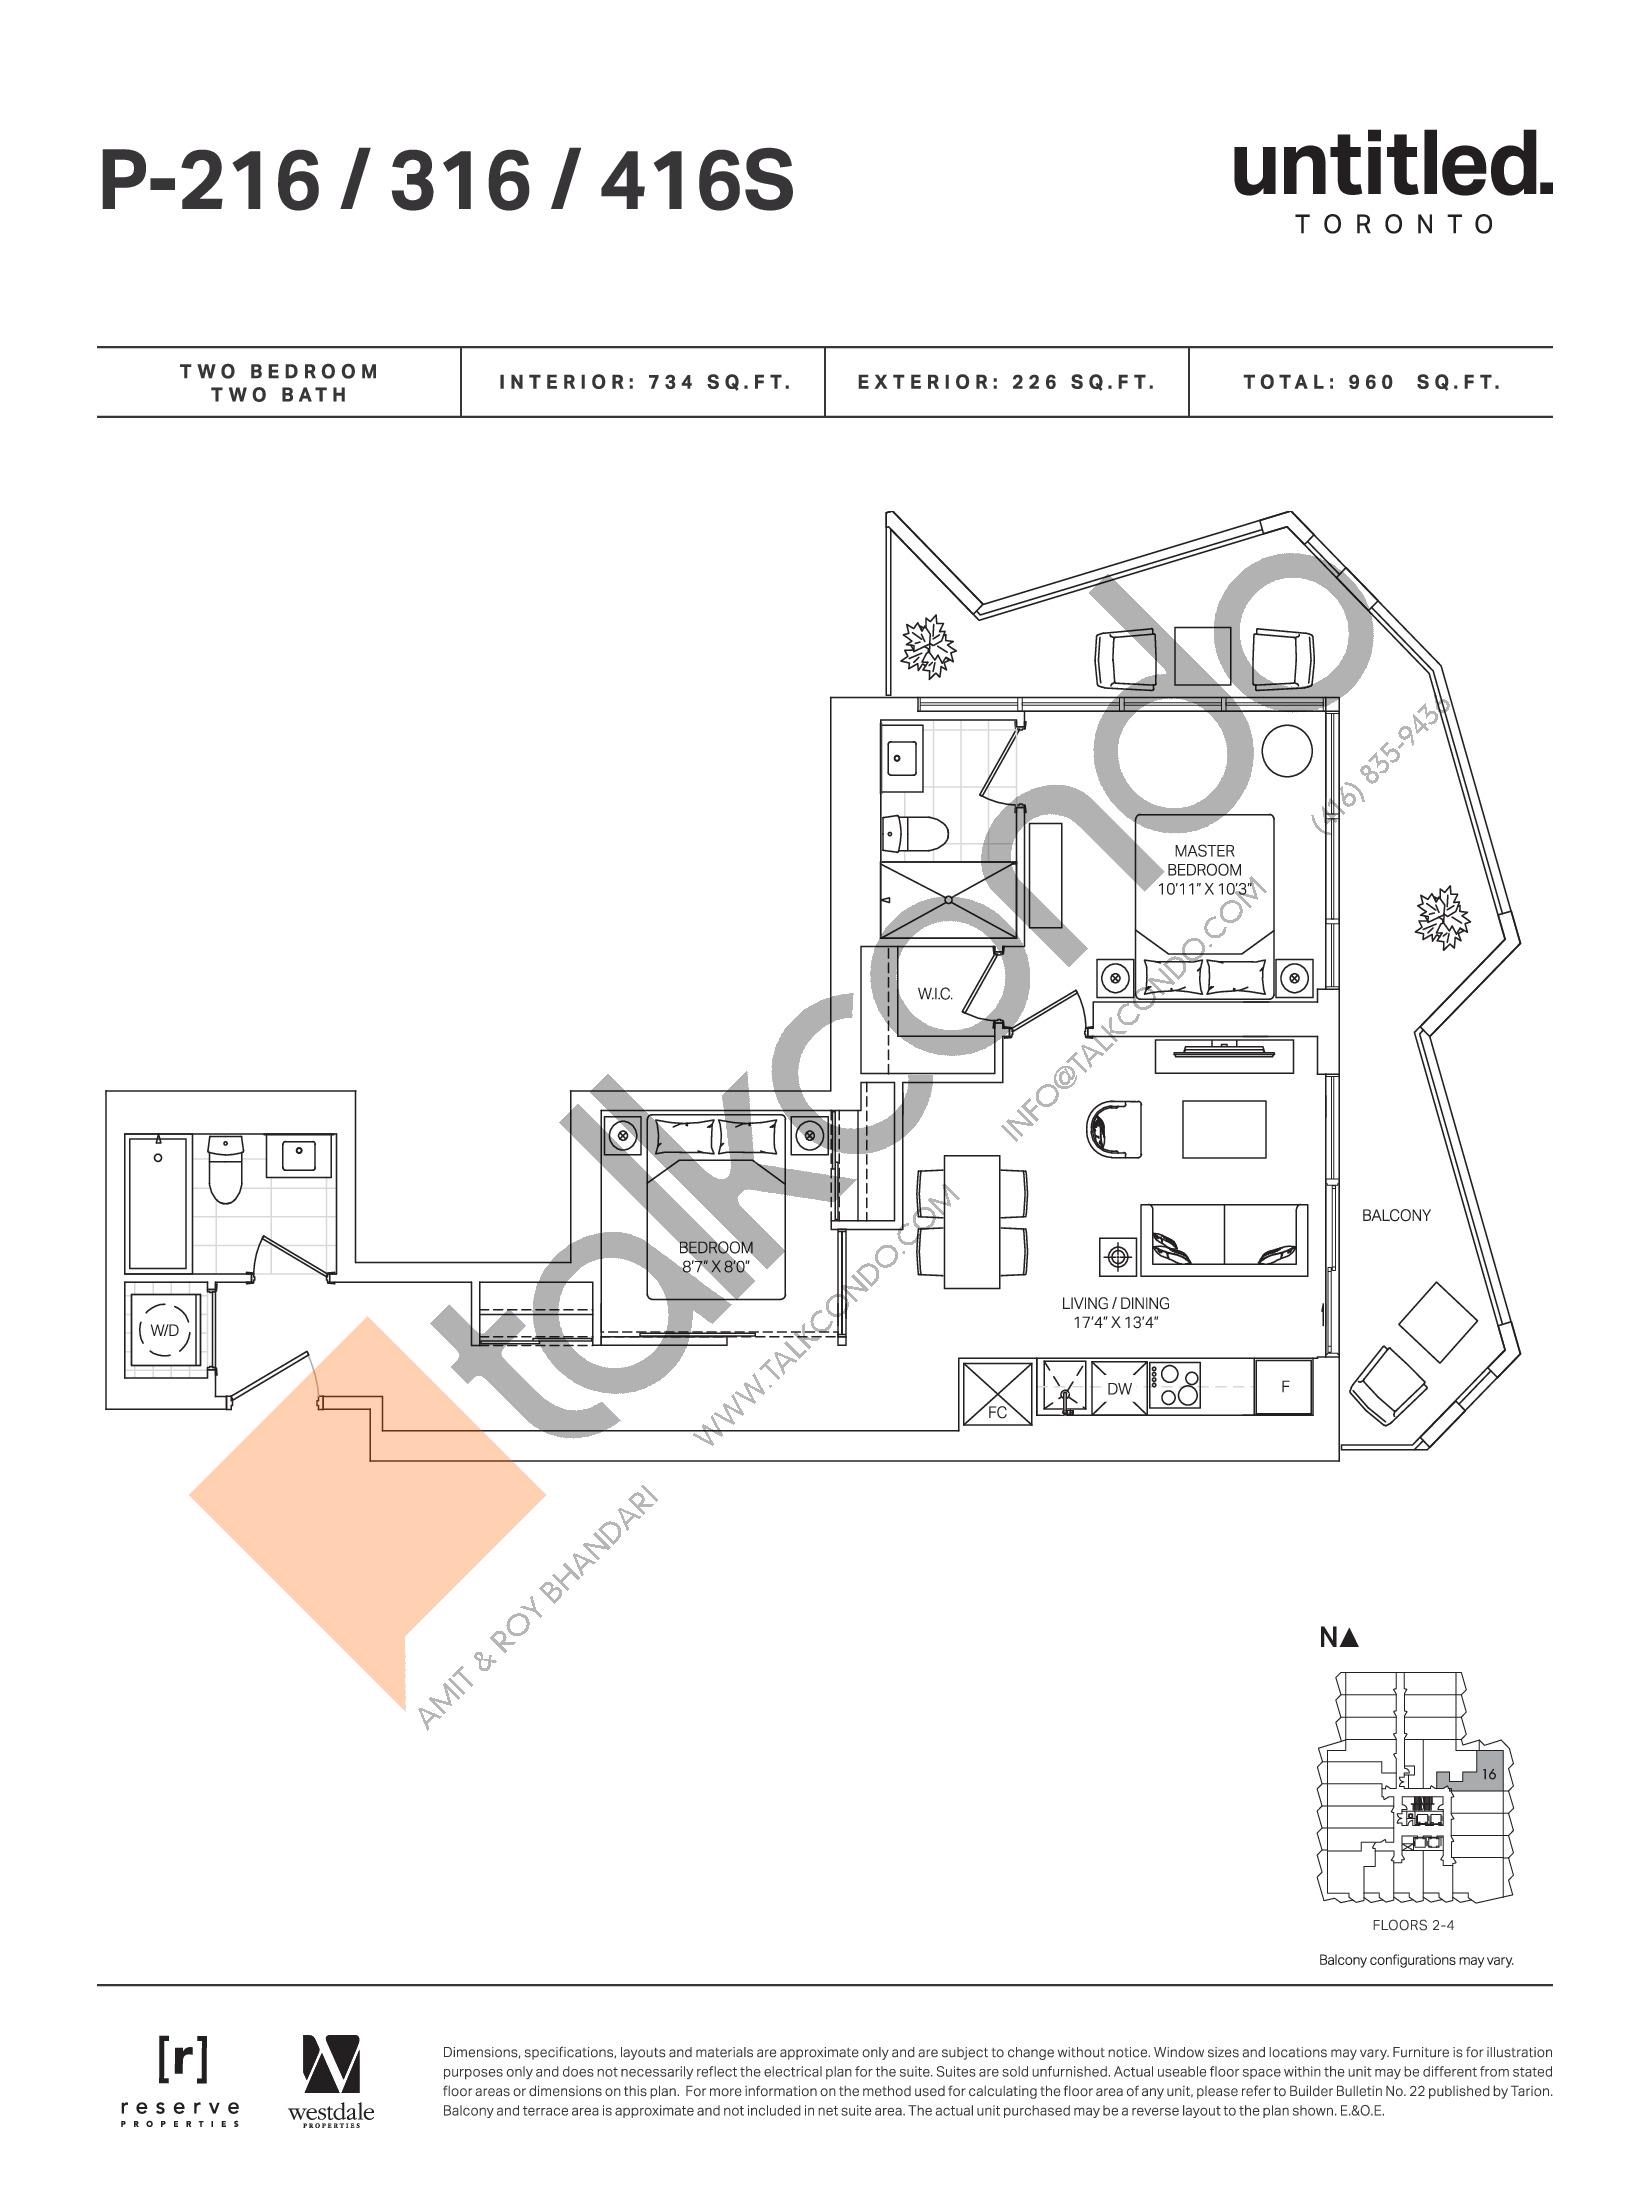 P-216 / 316 / 416S Floor Plan at Untitled Toronto Condos - 734 sq.ft